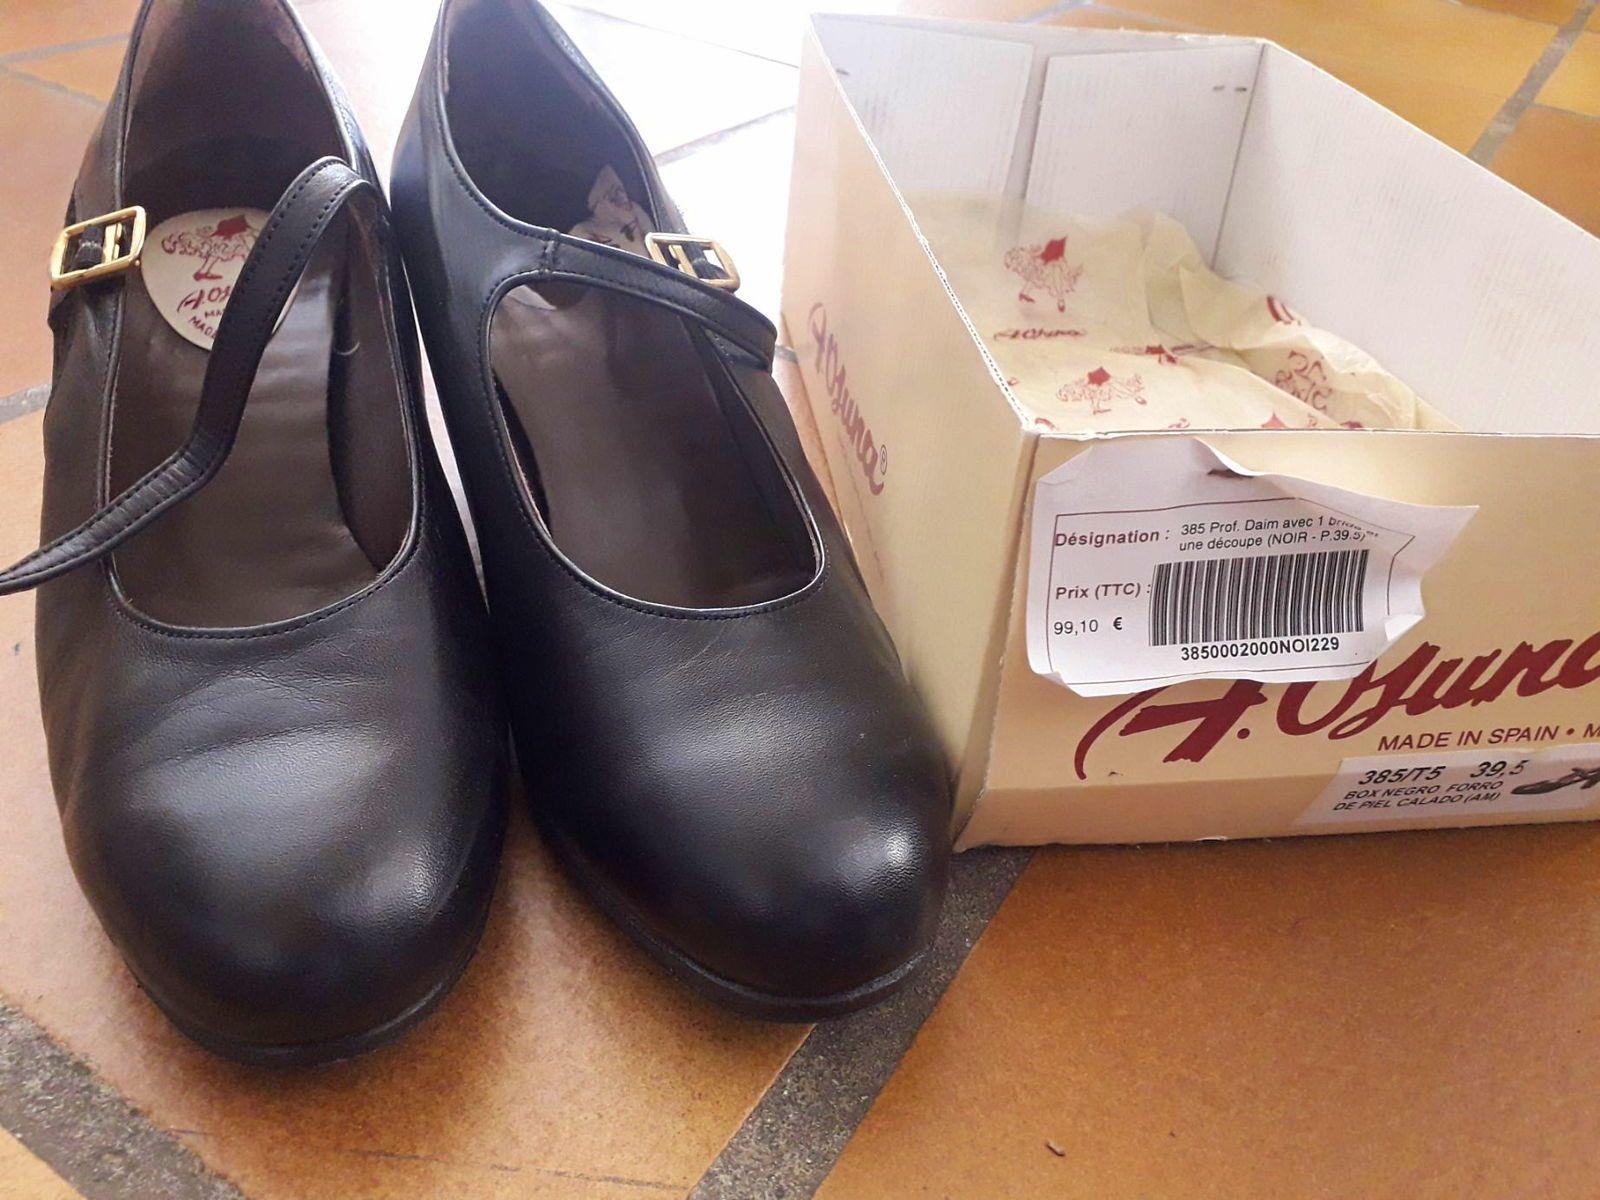 Chaussures flamenco comme neuves